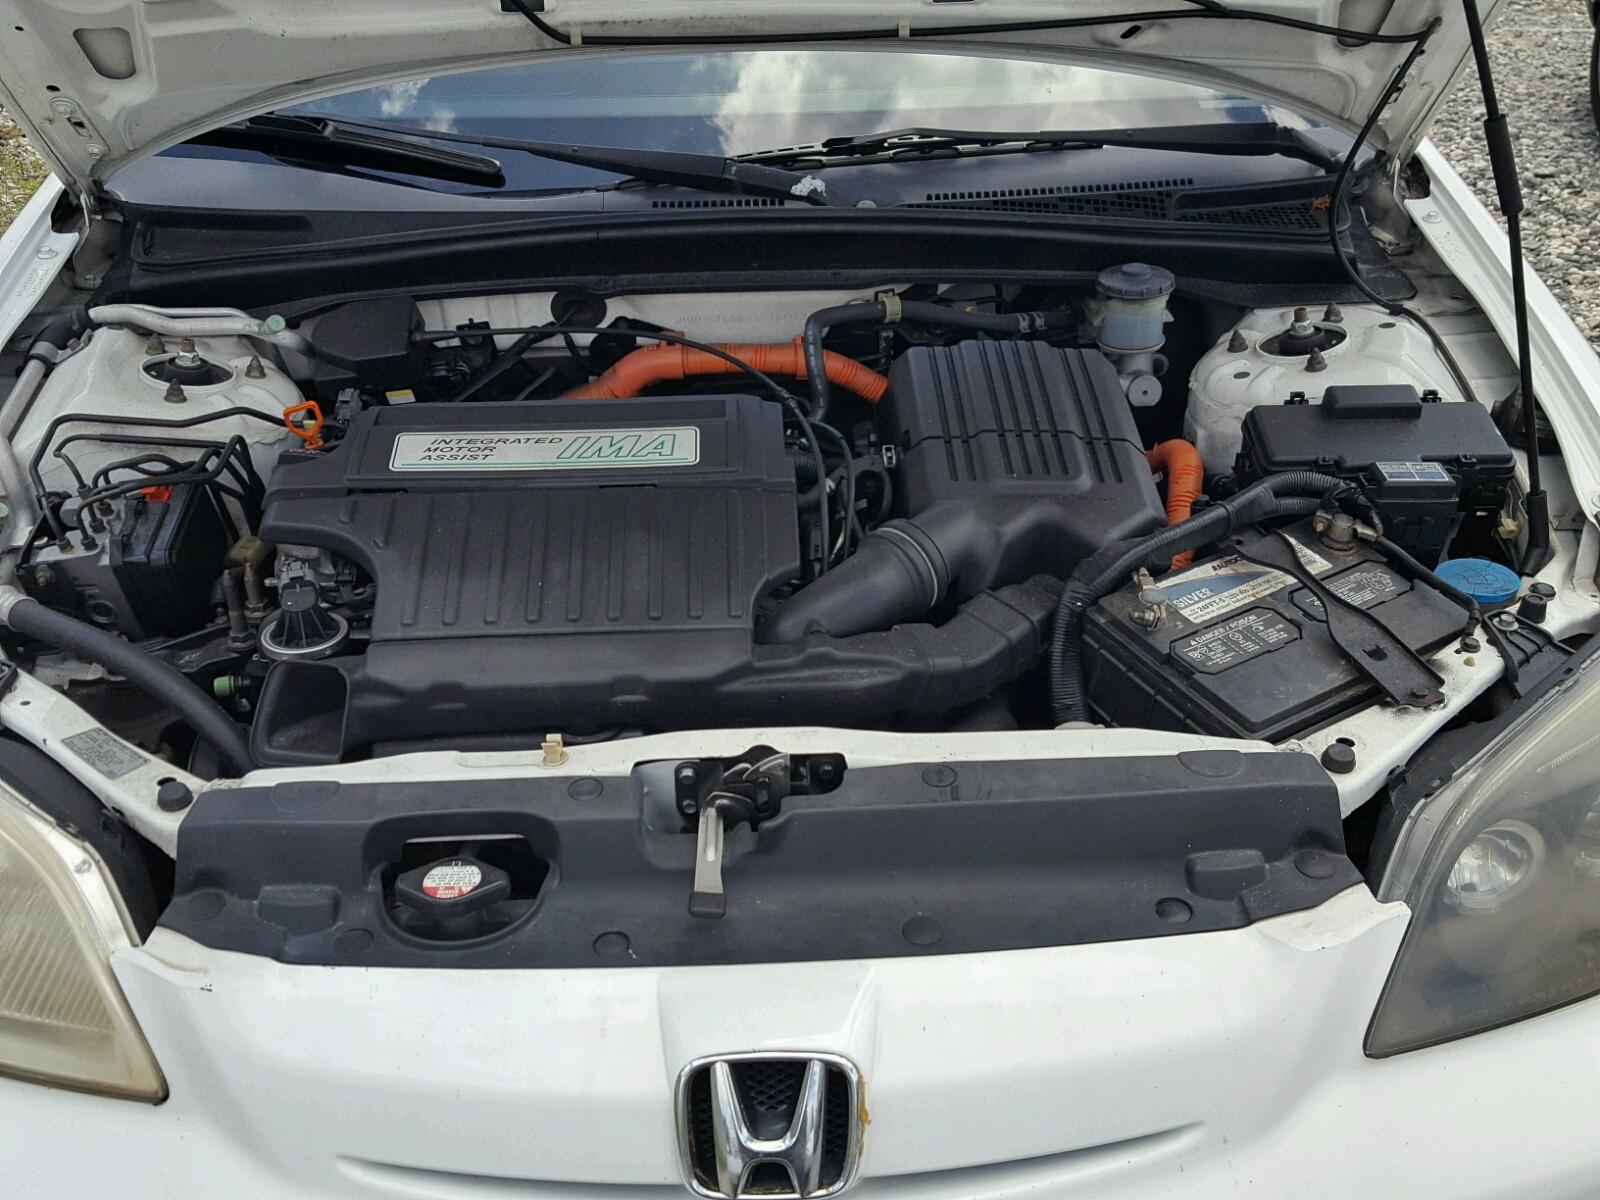 2003 Honda Civic Hybrid For Sale At Copart Miami Fl Lot 47070198